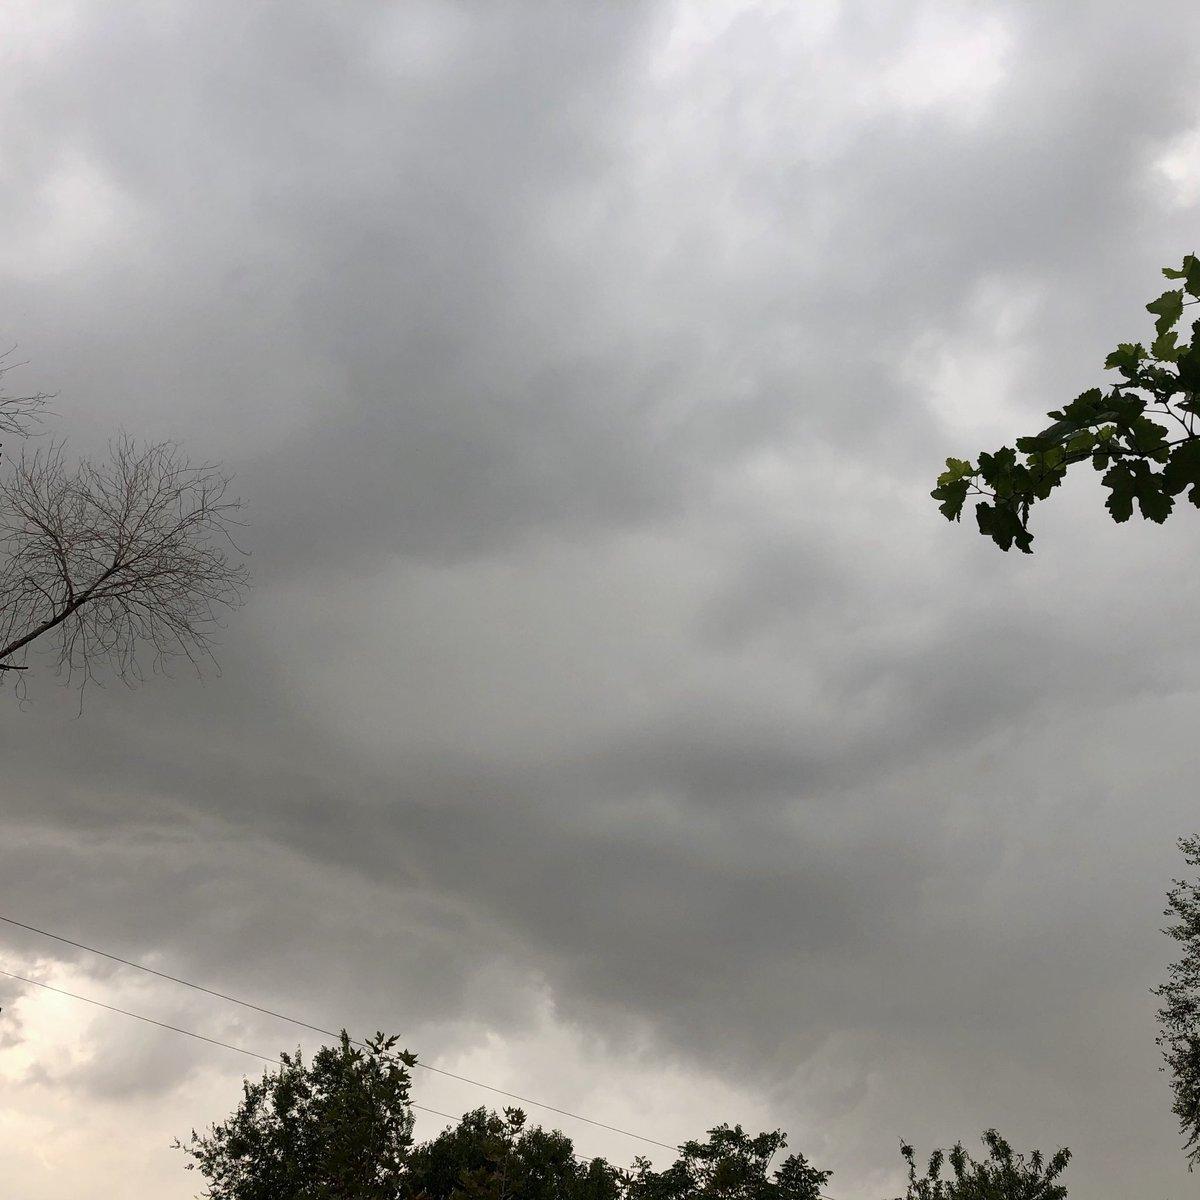 #Kabul sky time now https://t.co/2AcDksyG53